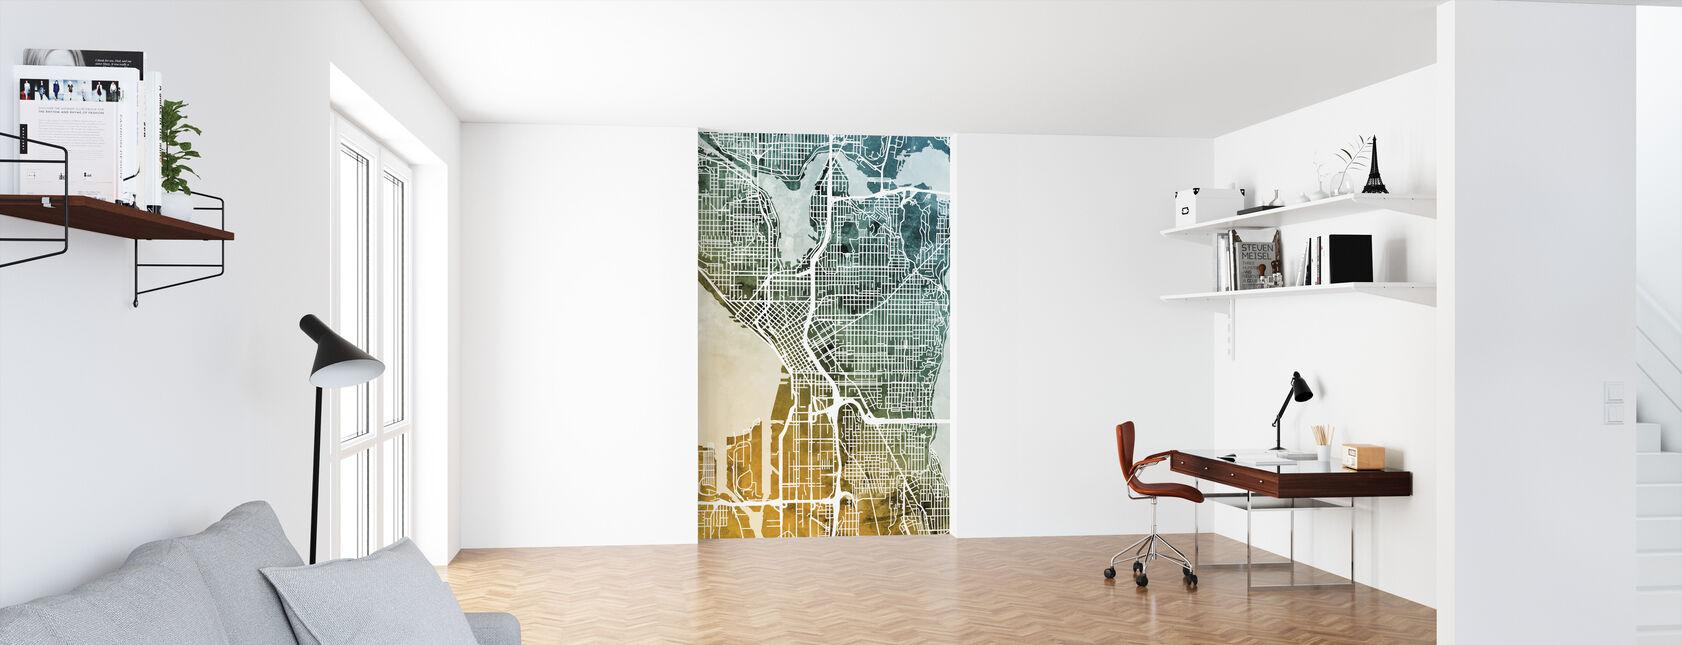 Seattle Washington Street Map - Wallpaper - Office